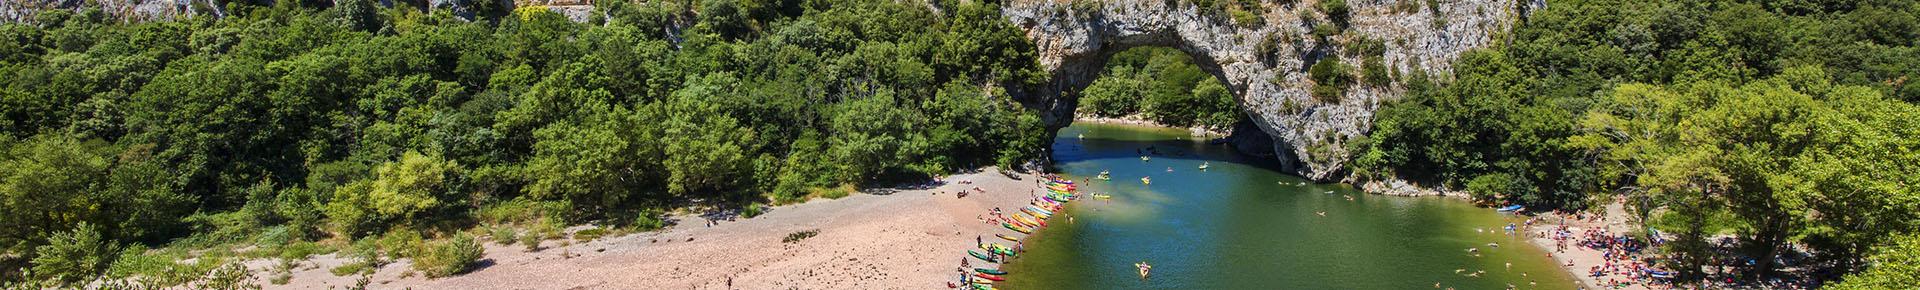 Visites Le Grillou Camping